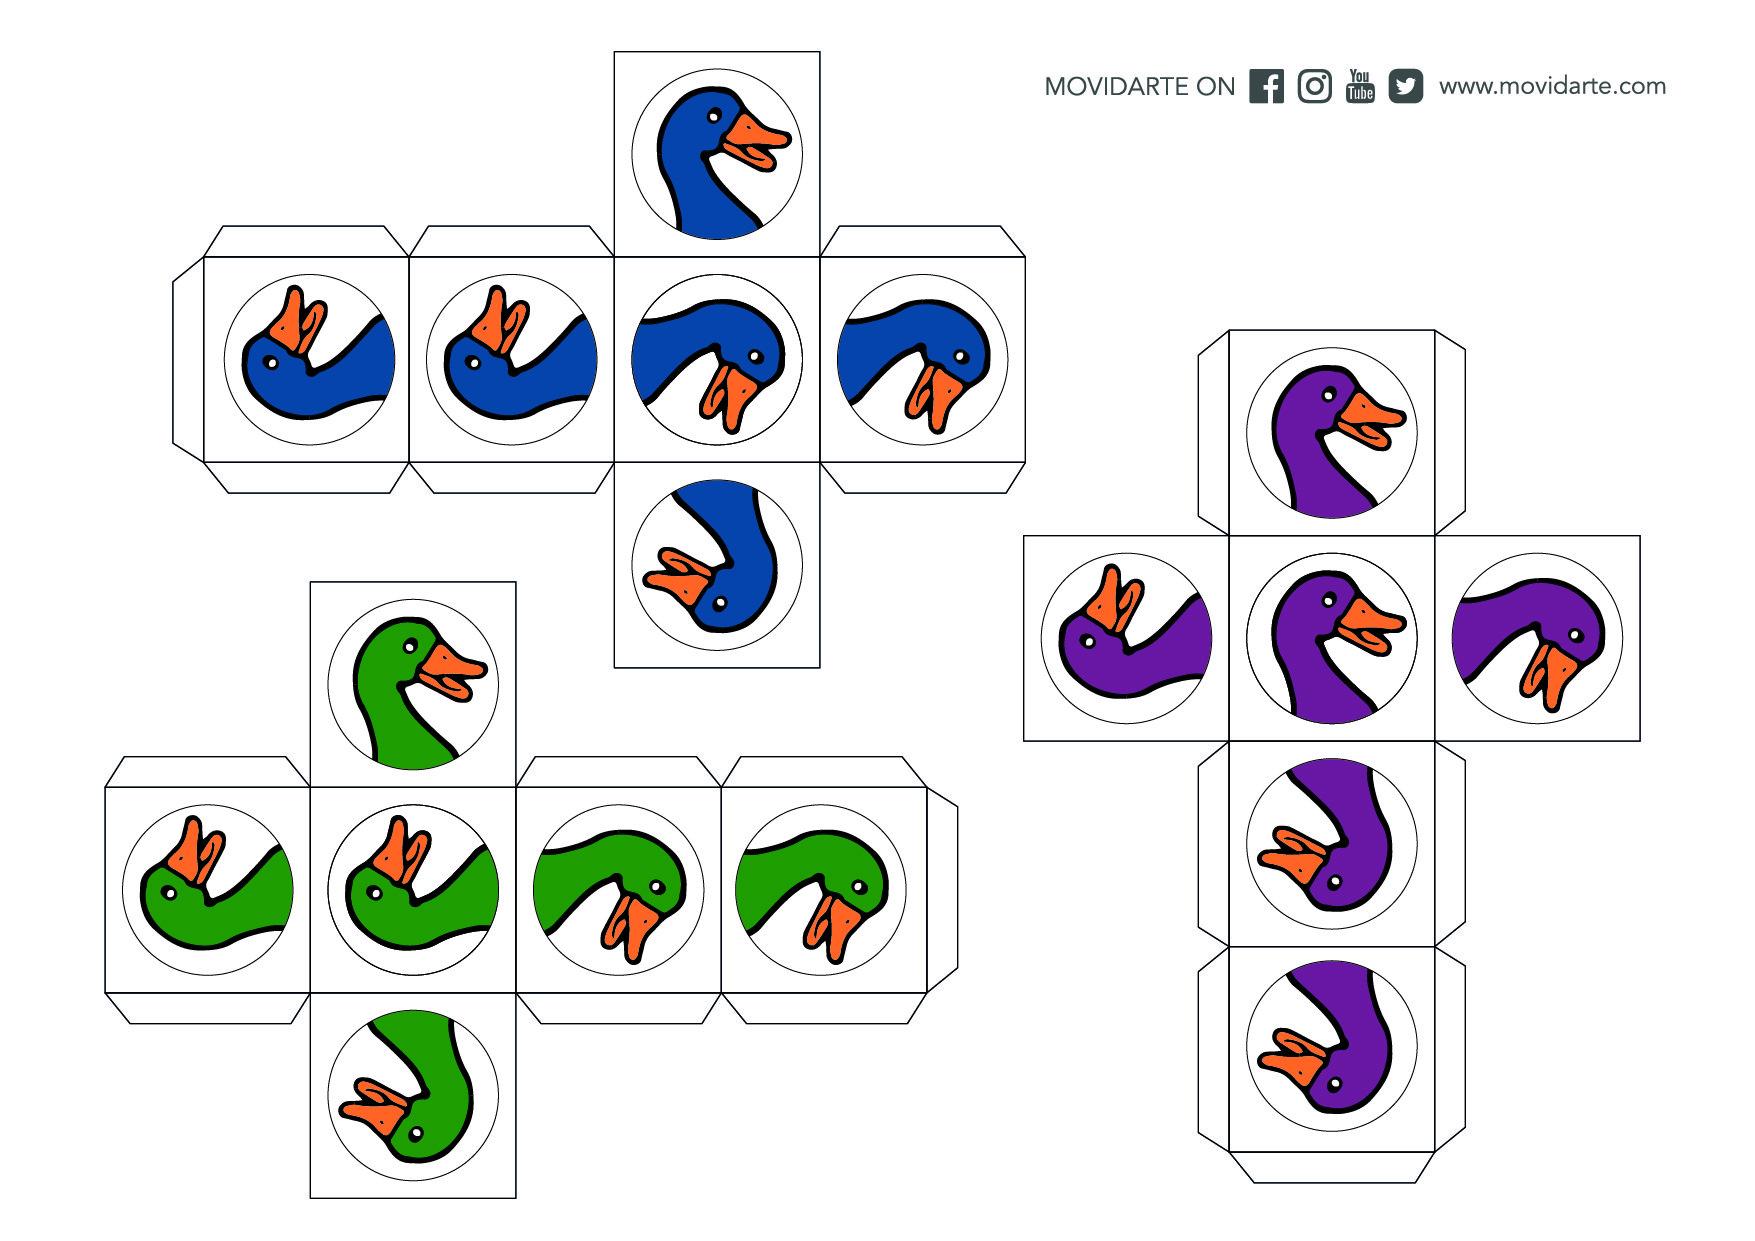 Gioco dell'Oca Ecologico Gigante - Movidarte